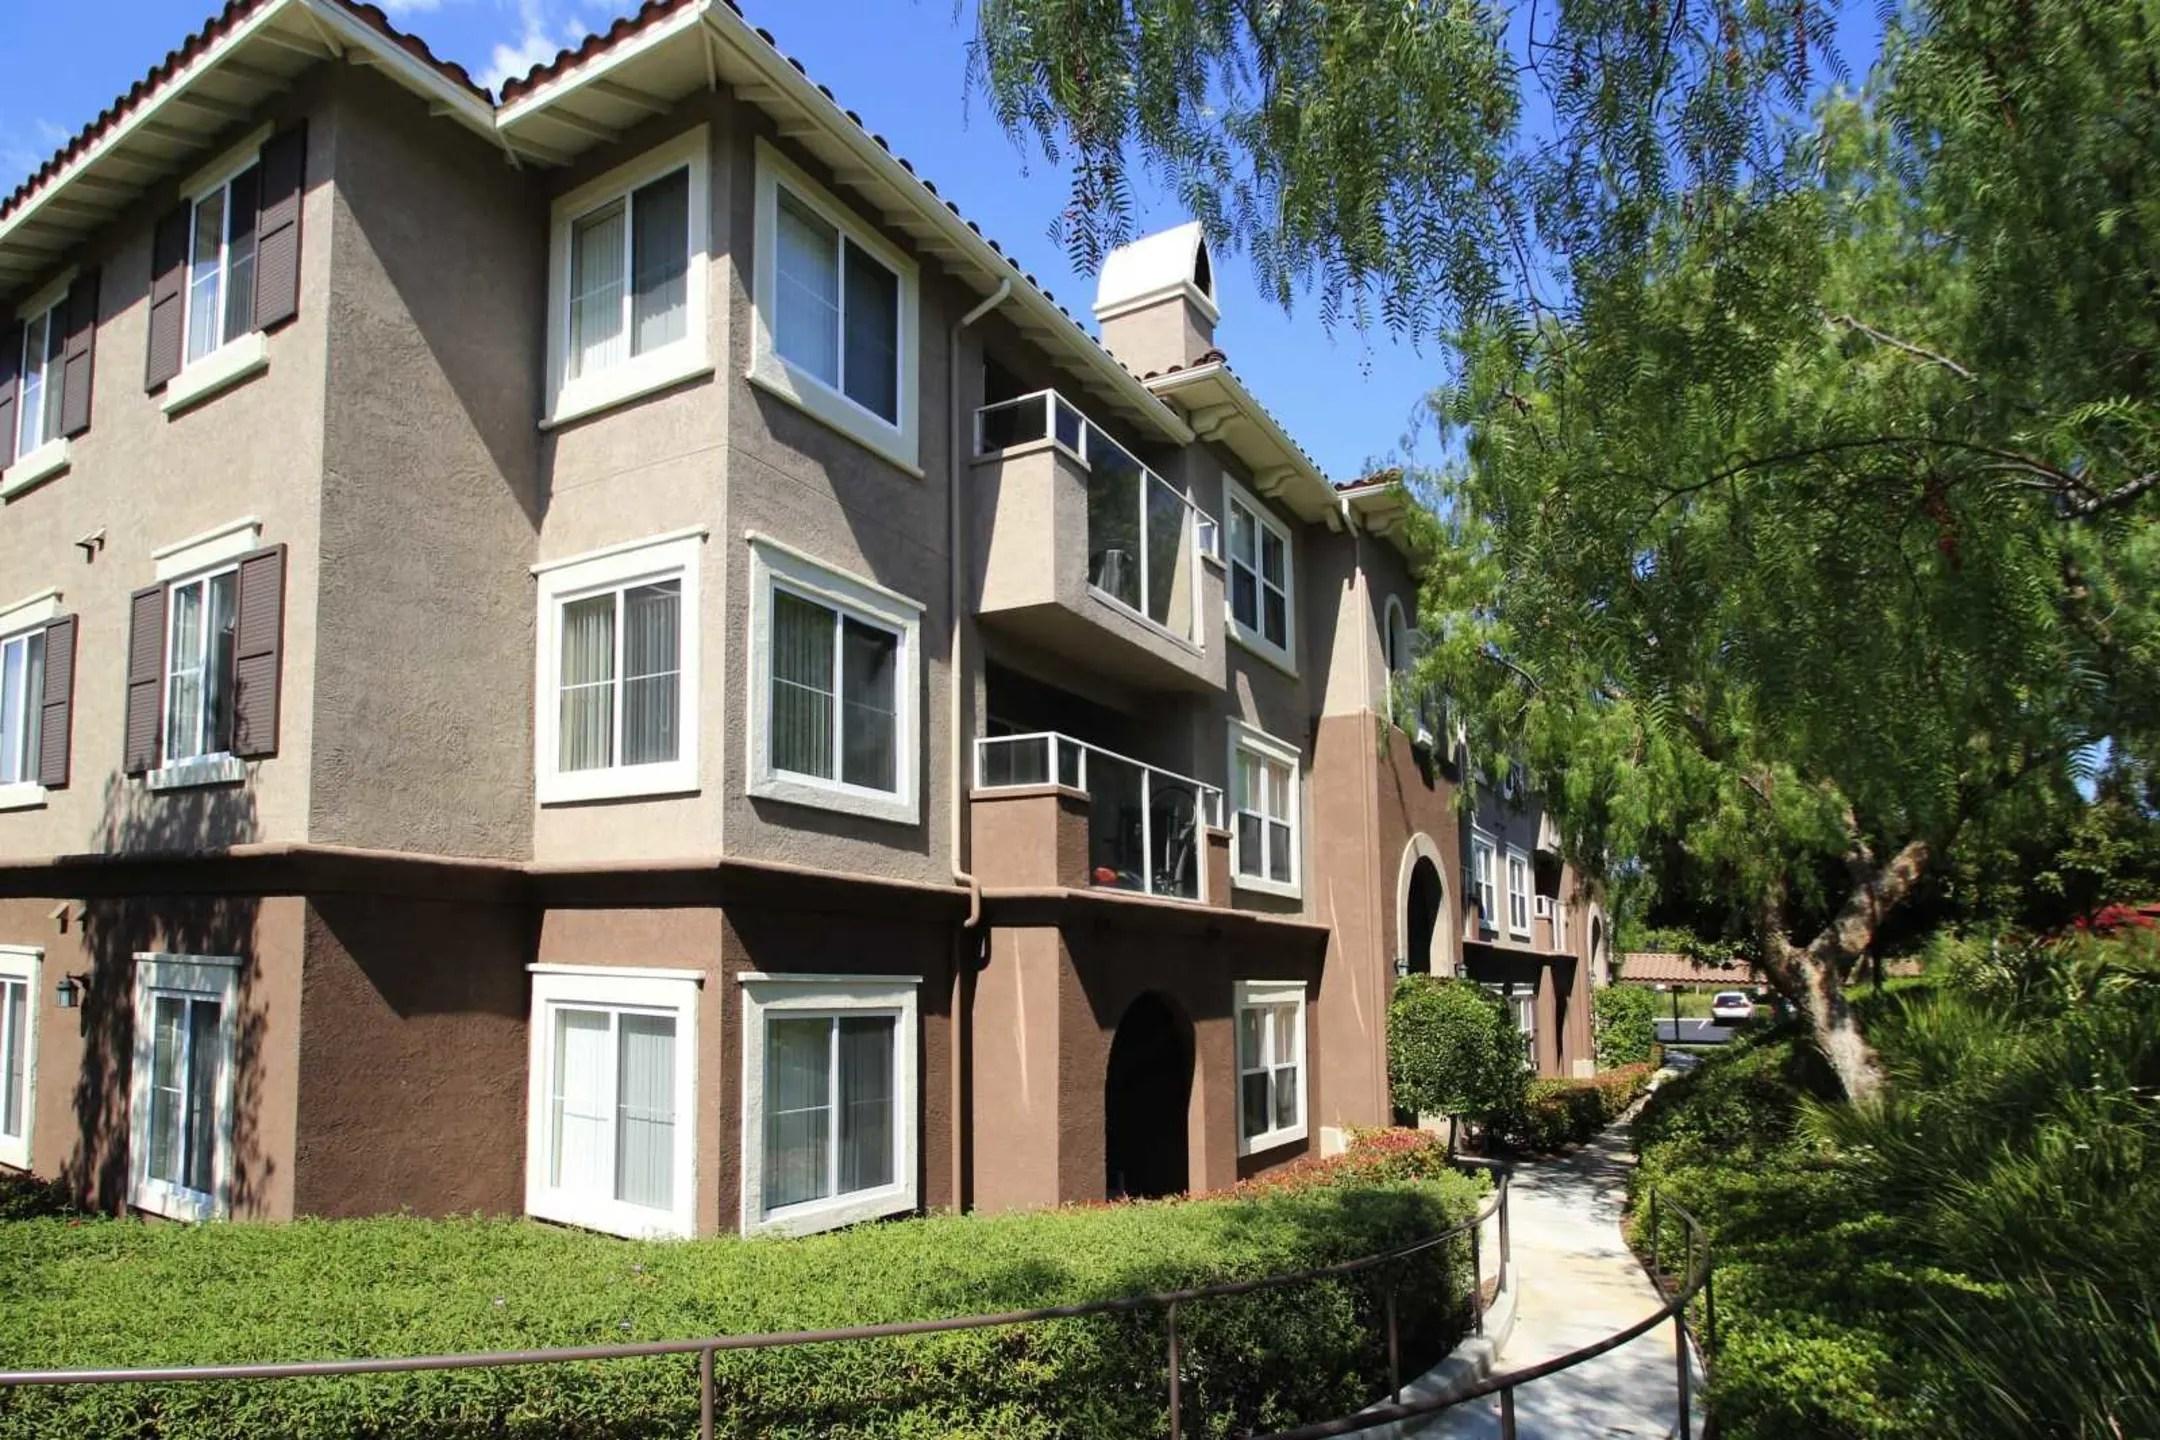 Missions At Chino Hills Apartments Chino Hills Ca 91709